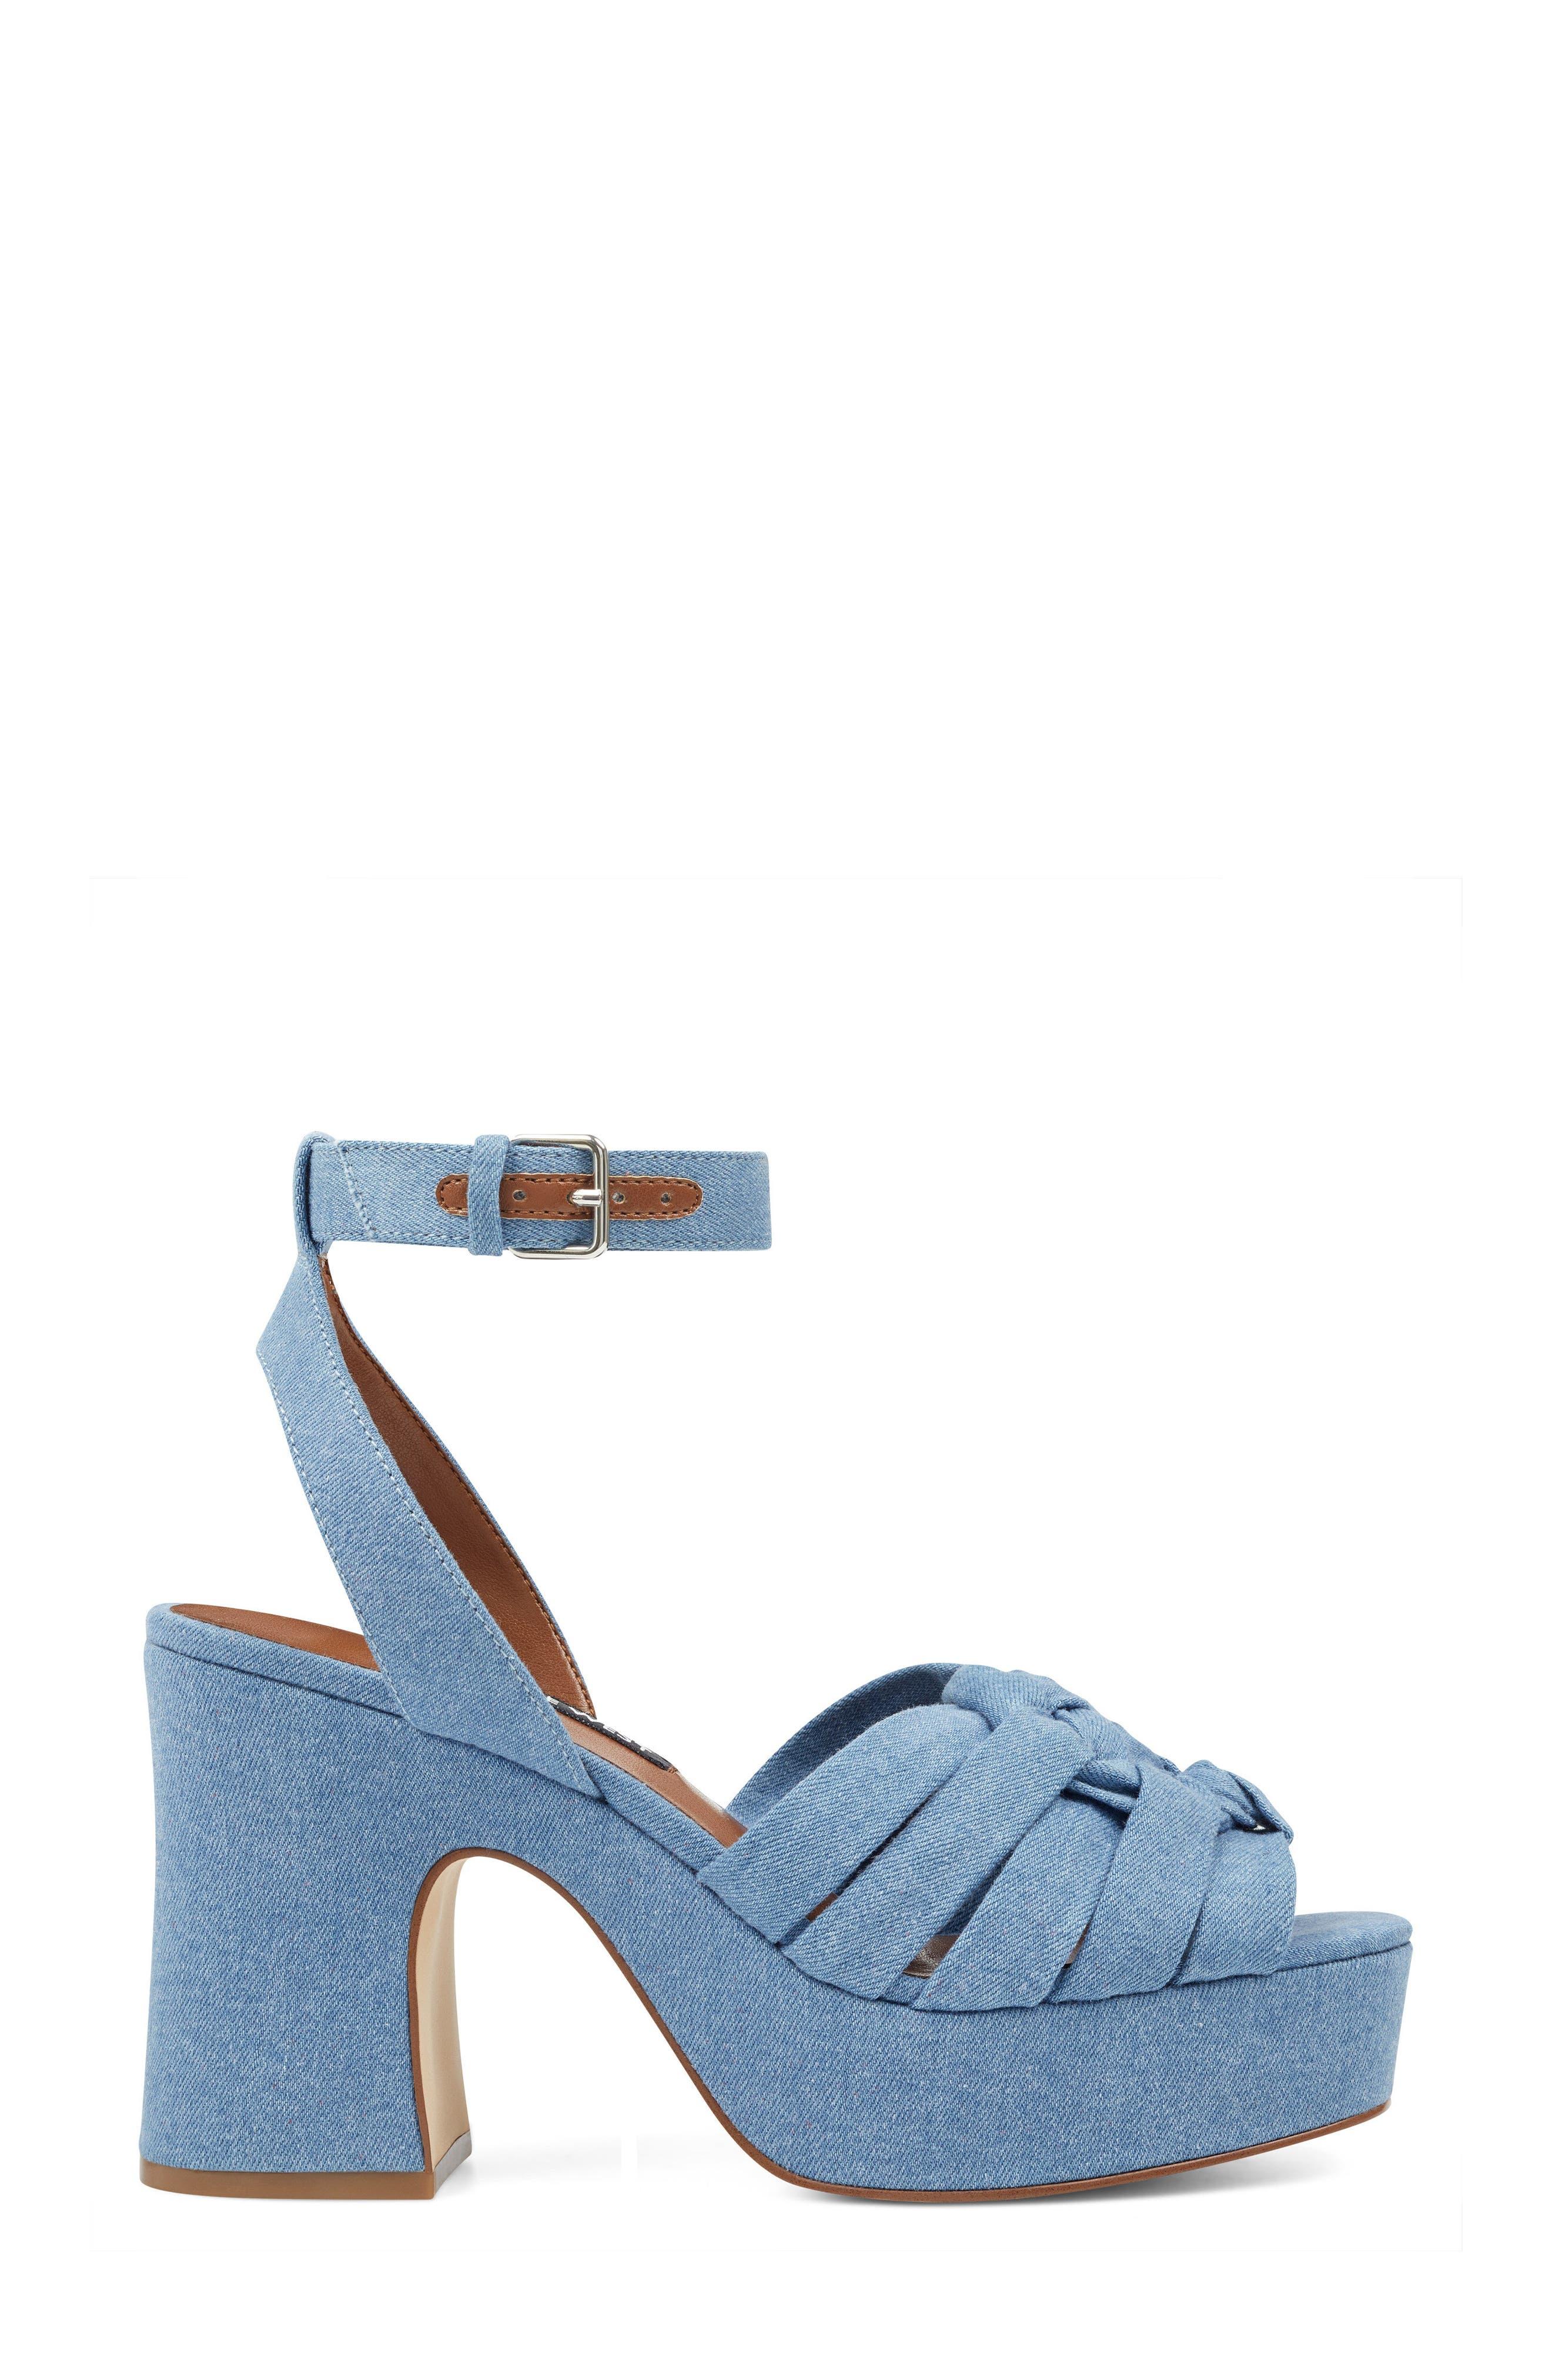 Fetuchini Platform Sandal,                             Alternate thumbnail 3, color,                             LIGHT BLUE DENIM